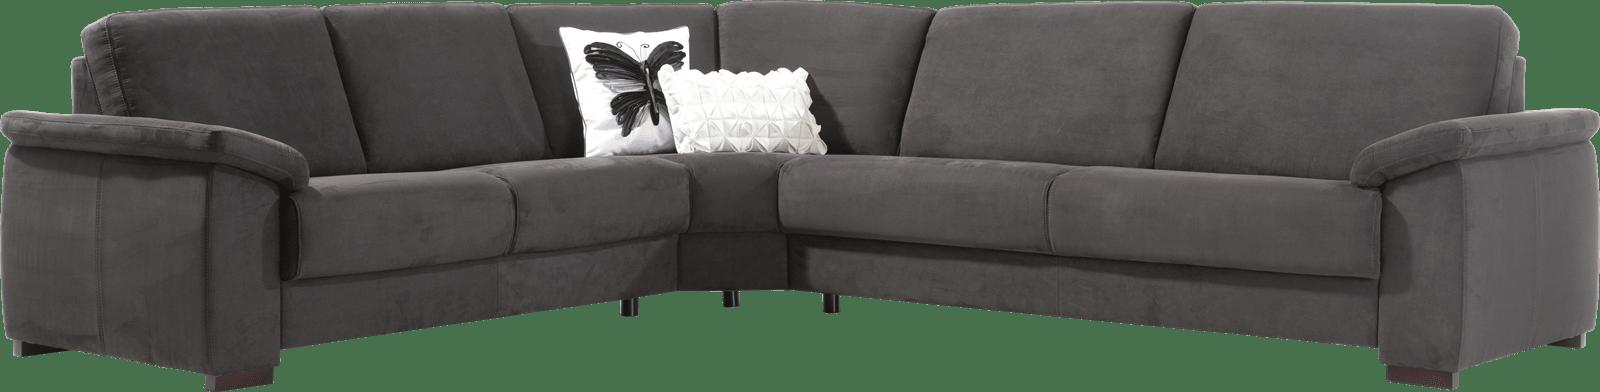 Henders and Hazel - Grenada - Sofas - 3 Sitzer Armlehne links - Eckteil - 3 Sitzer Armlehne rechts